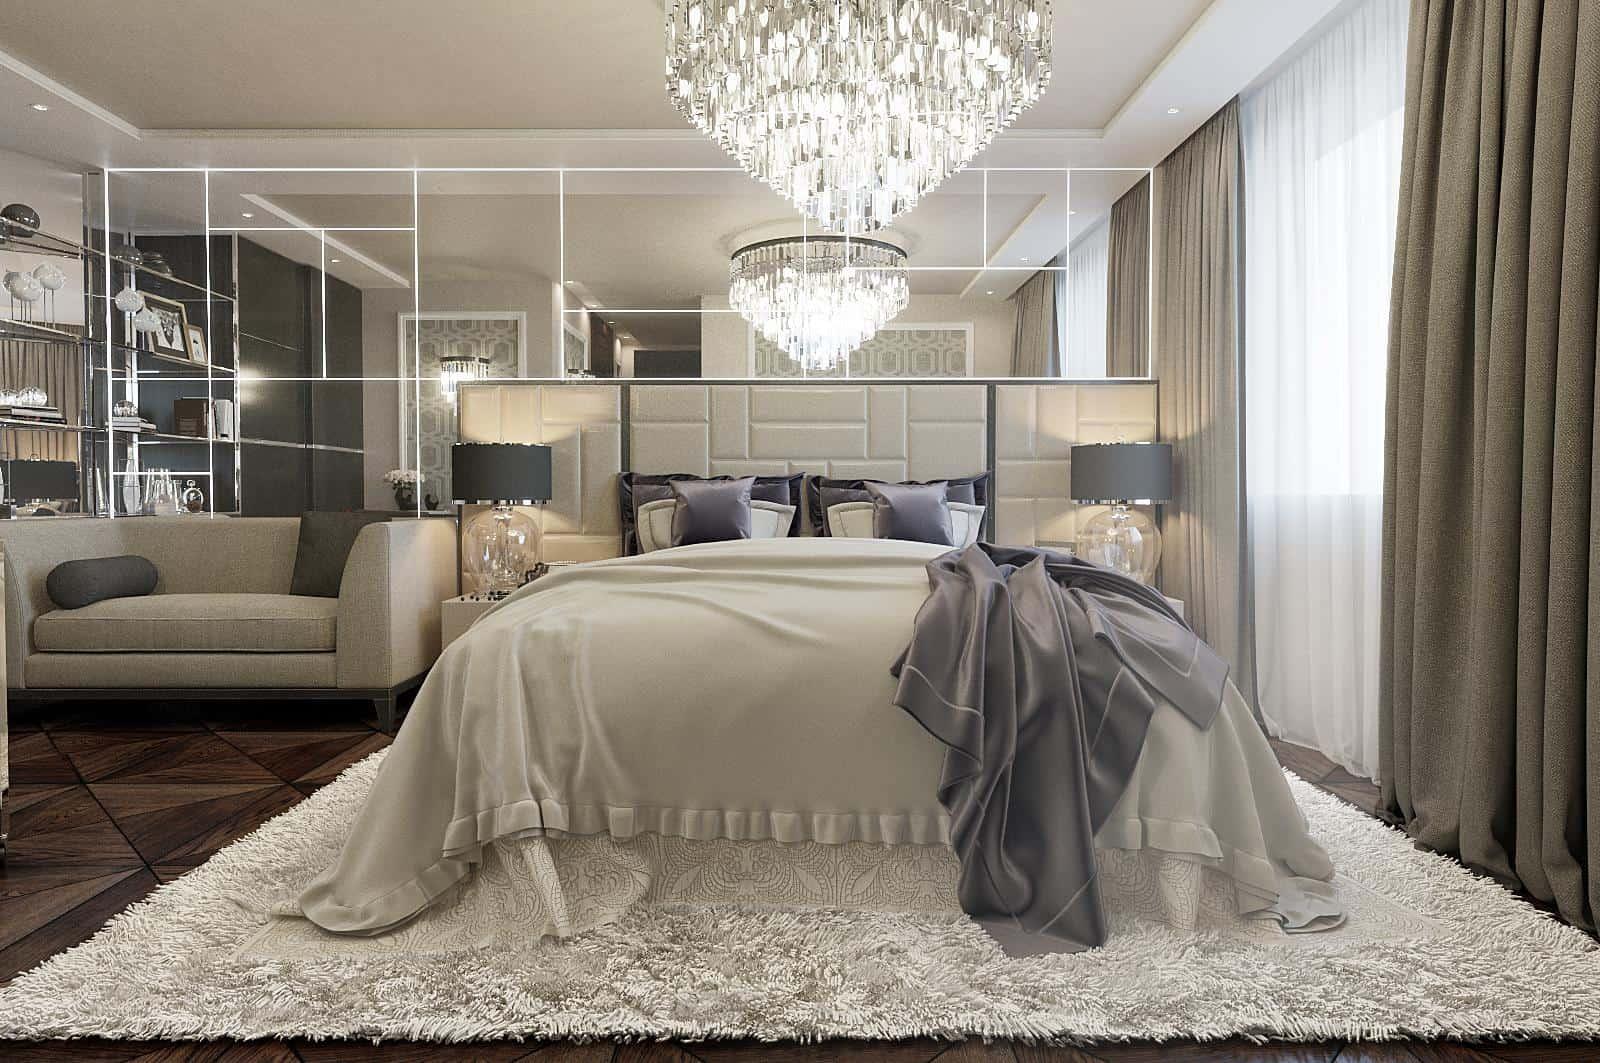 Boudoir Interior Design Ideas for the Refined Woman's Taste. Classic design with mirroring closet